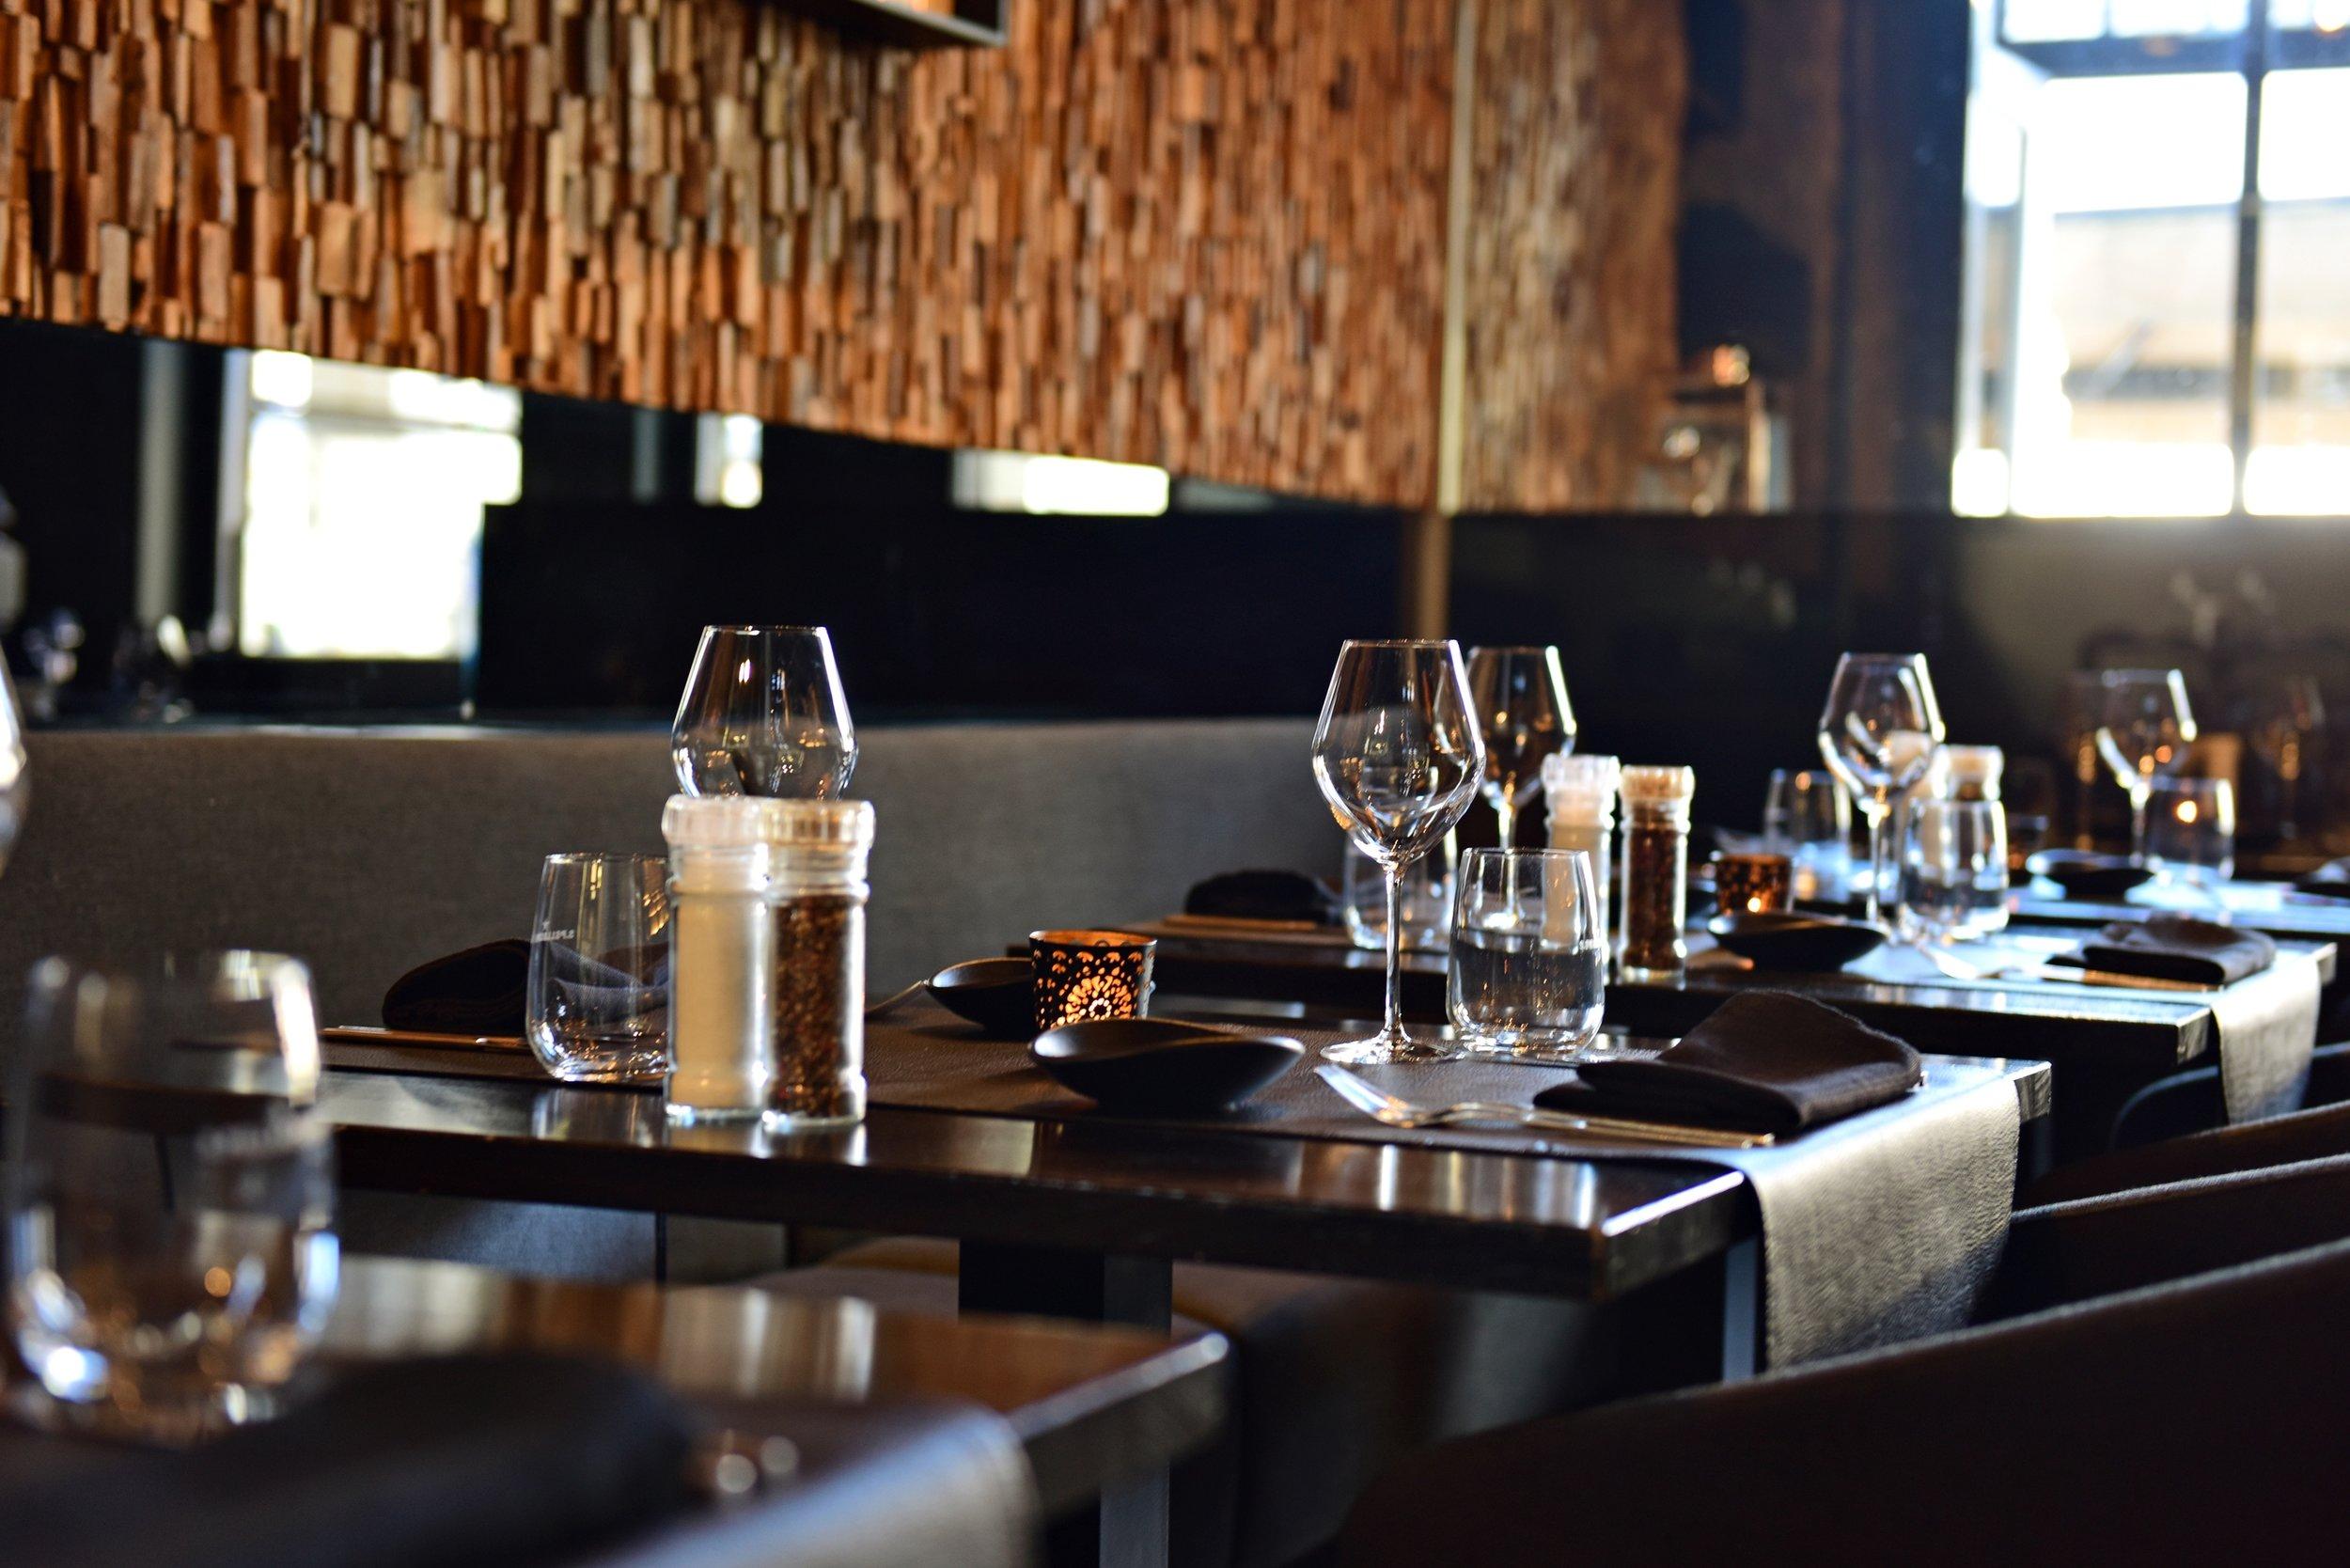 1 brasserie restaurant barleys barley's dendermonde grote markt bart albrecht tablefever.jpg